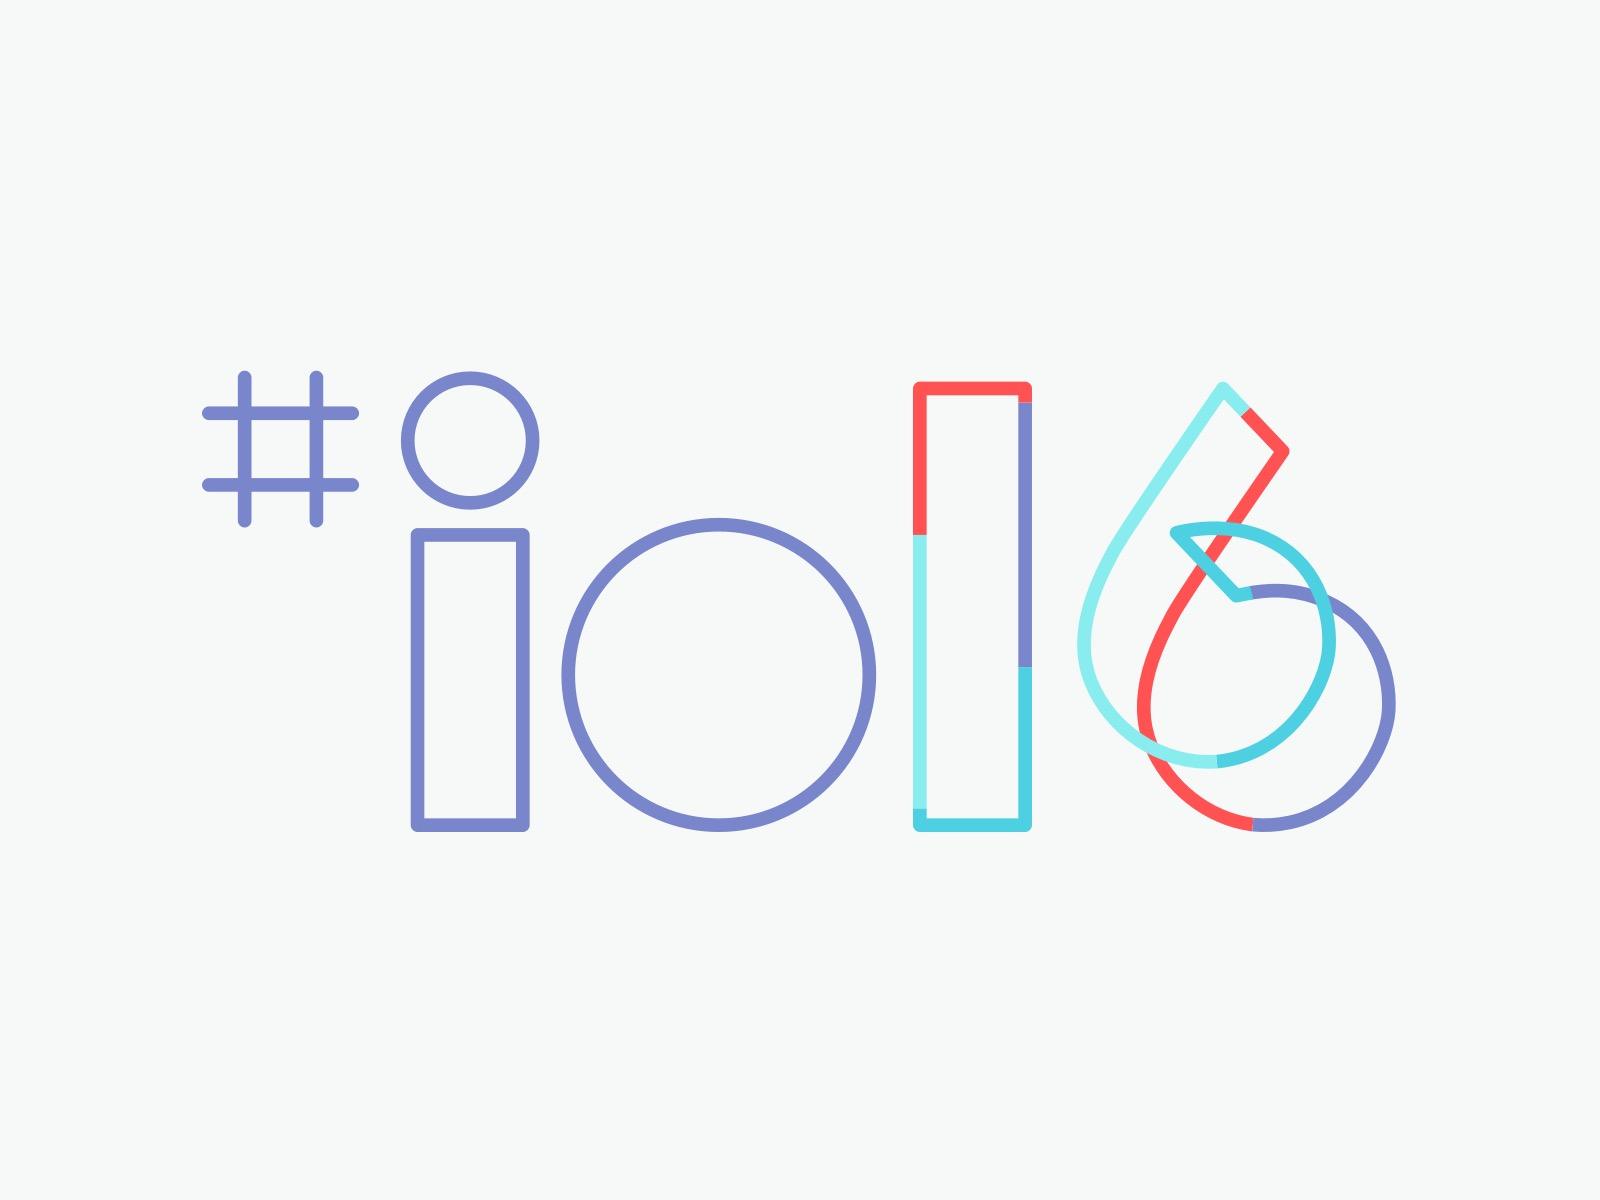 io16-logo.jpg